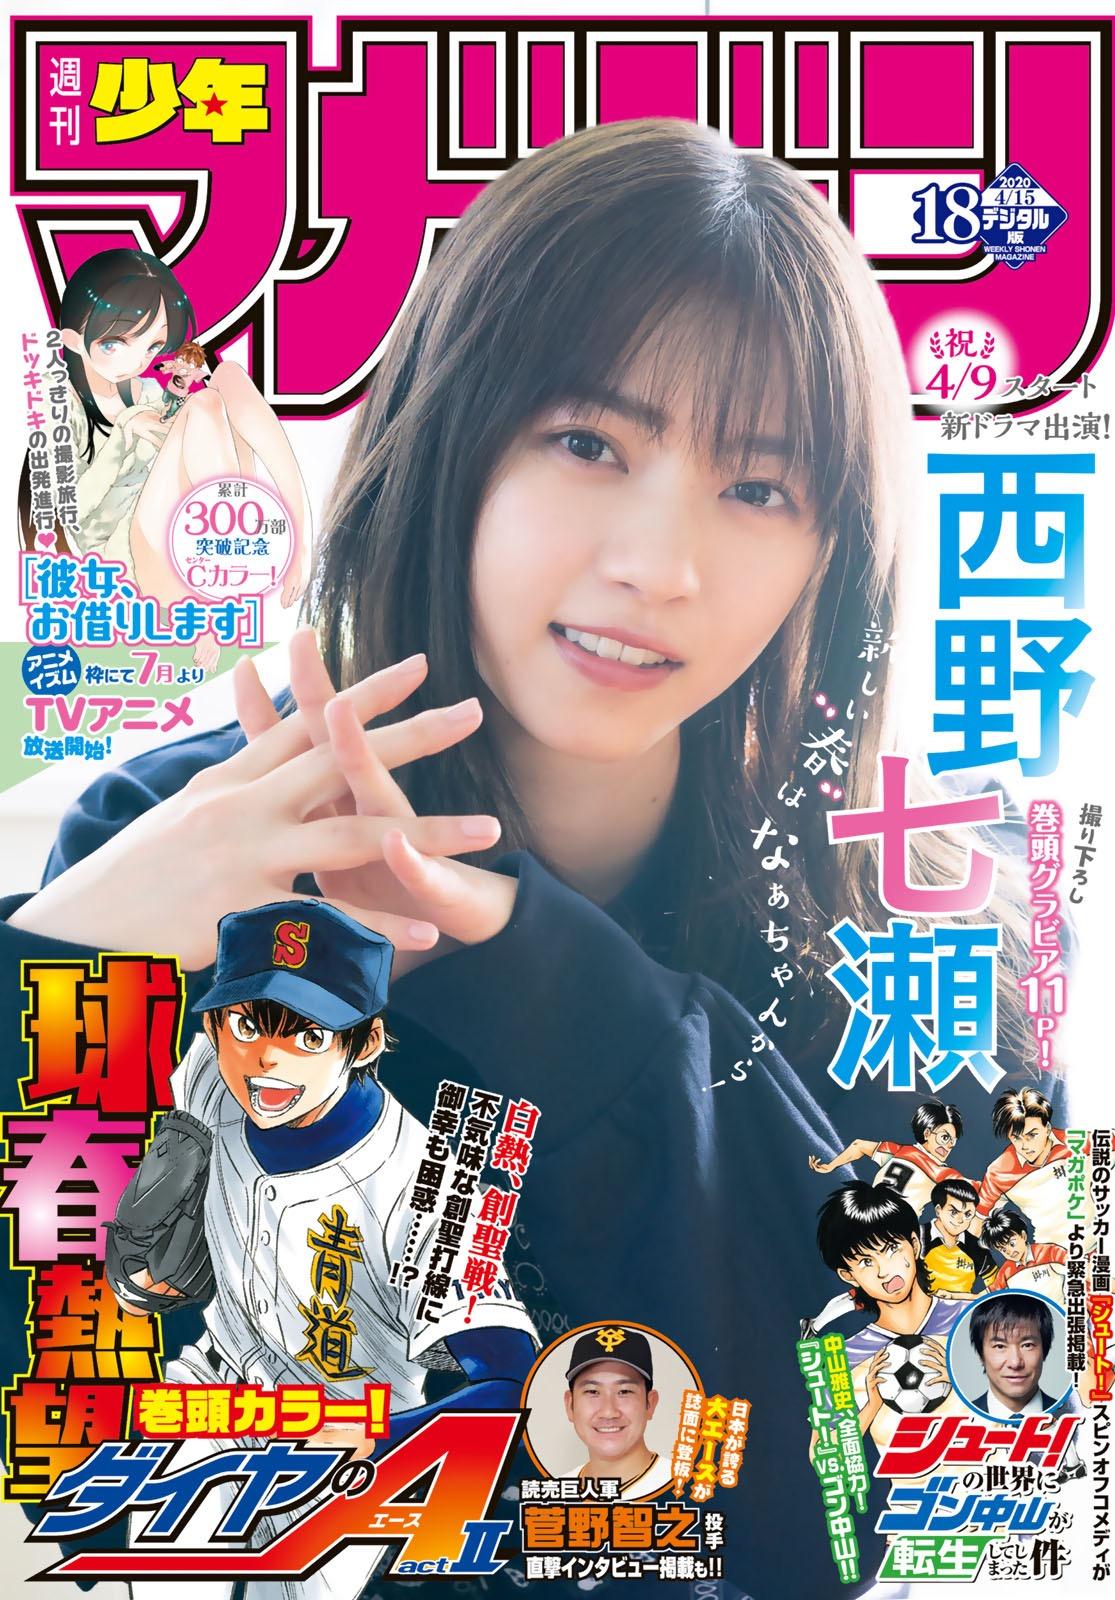 週刊少年マガジン 2020年04月15日号  18号 乃木坂46 西野七瀬